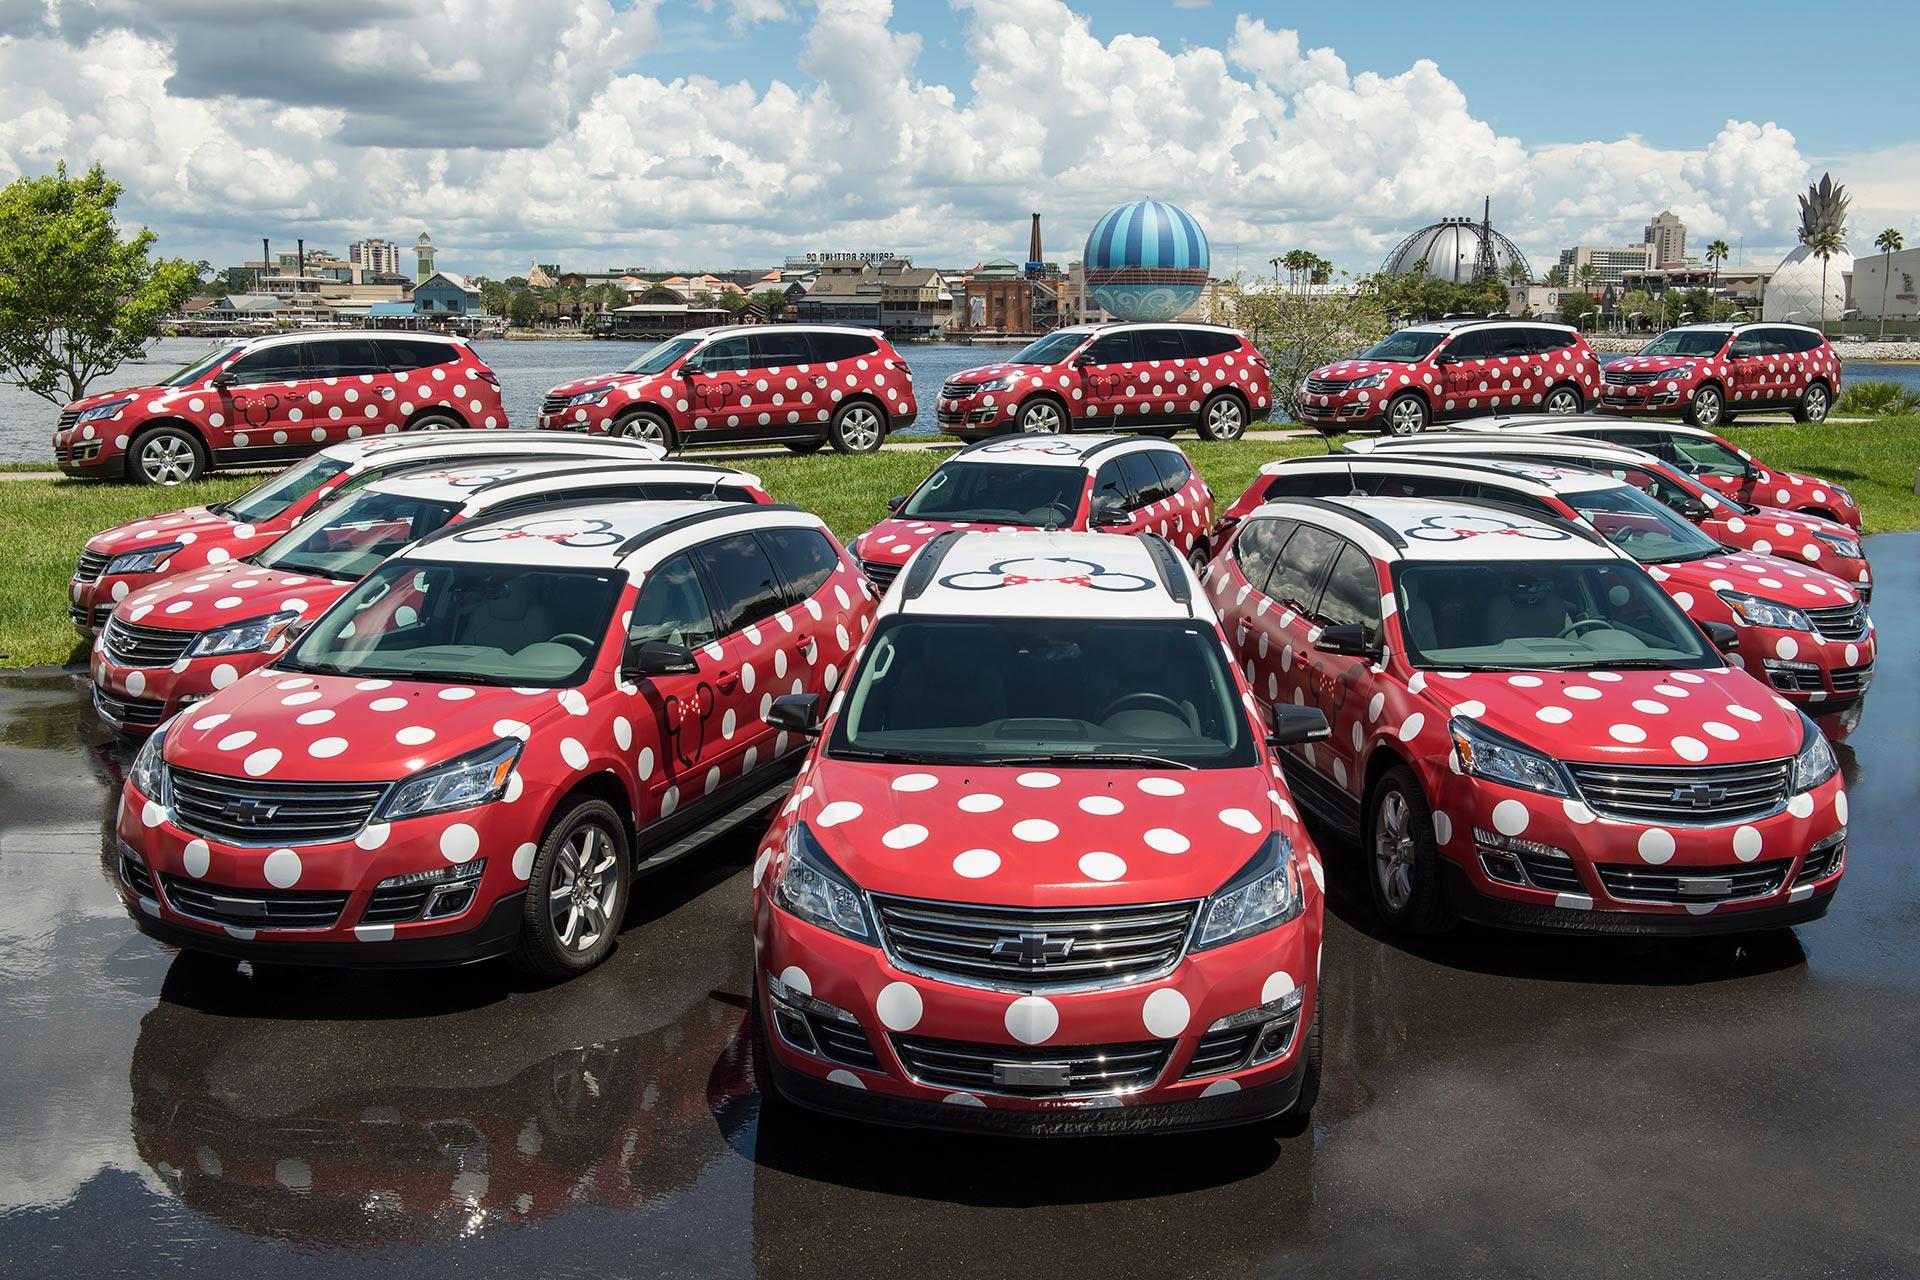 Minnie Van transportation service at Disney World in Florida.